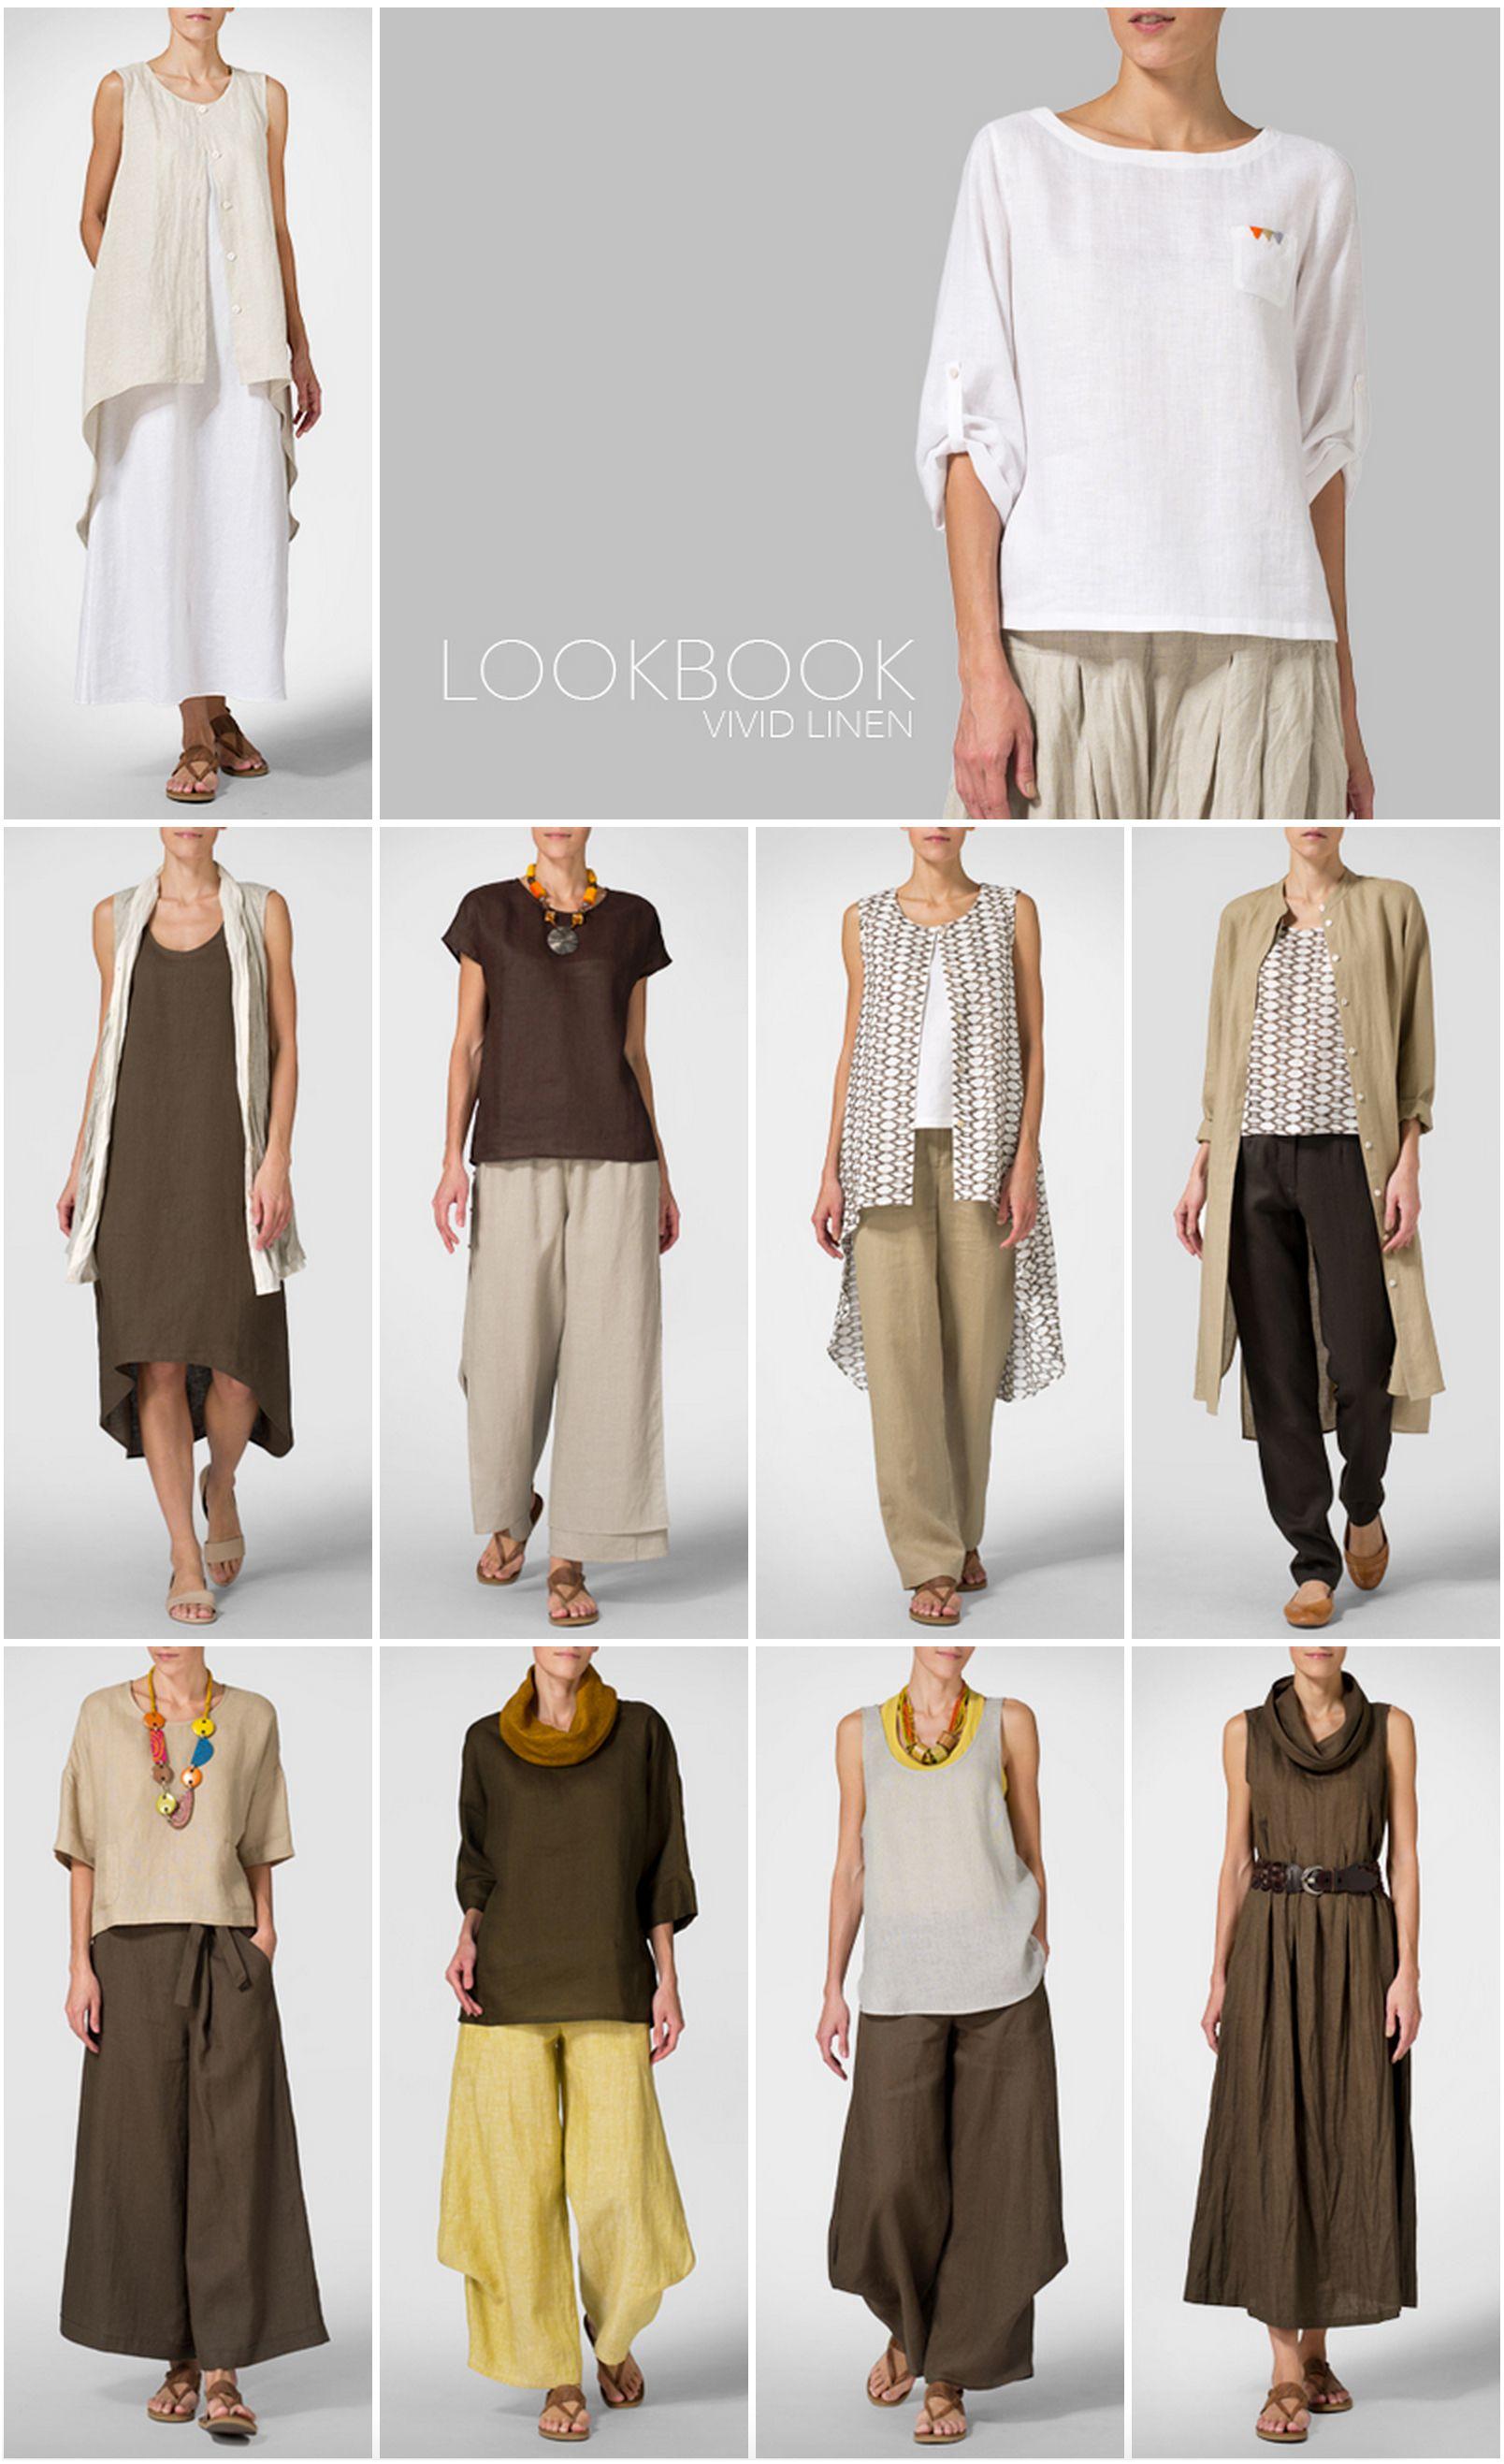 VIVID LINEN clothing - LOOKBOOK | lino cucito | Pinterest | Costura ...